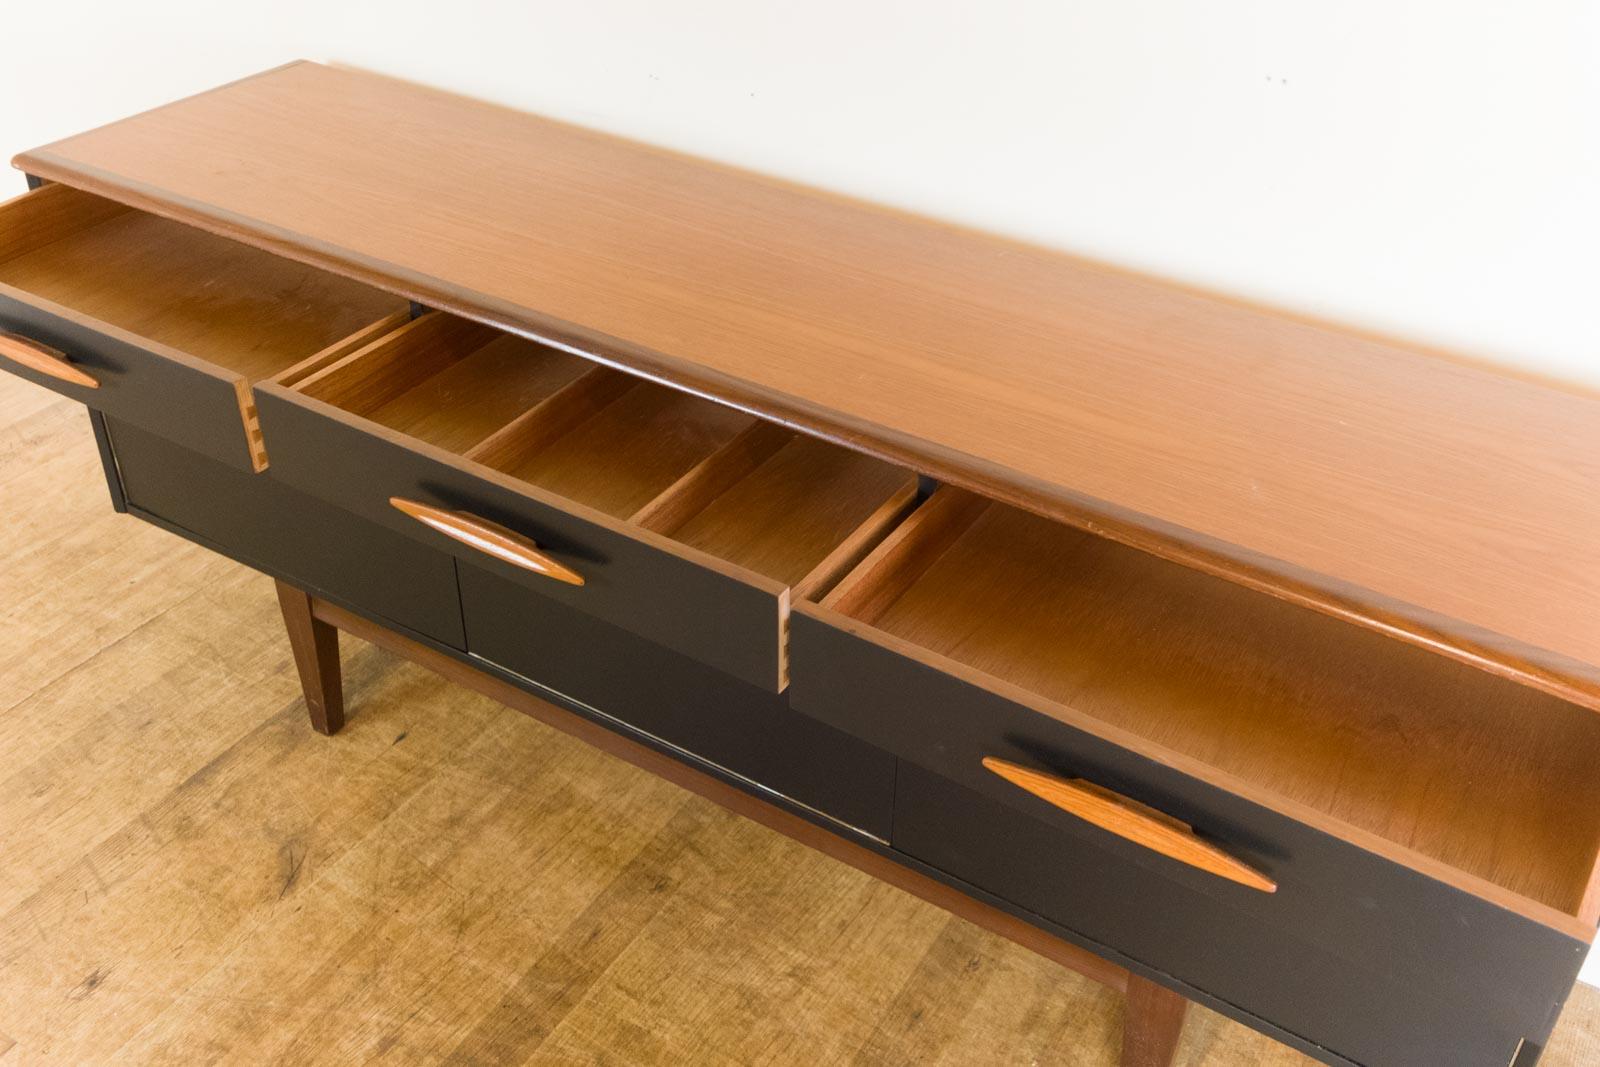 Vintage Retro Black and Teak Upcycled Painted Sideboard 1970s eBay